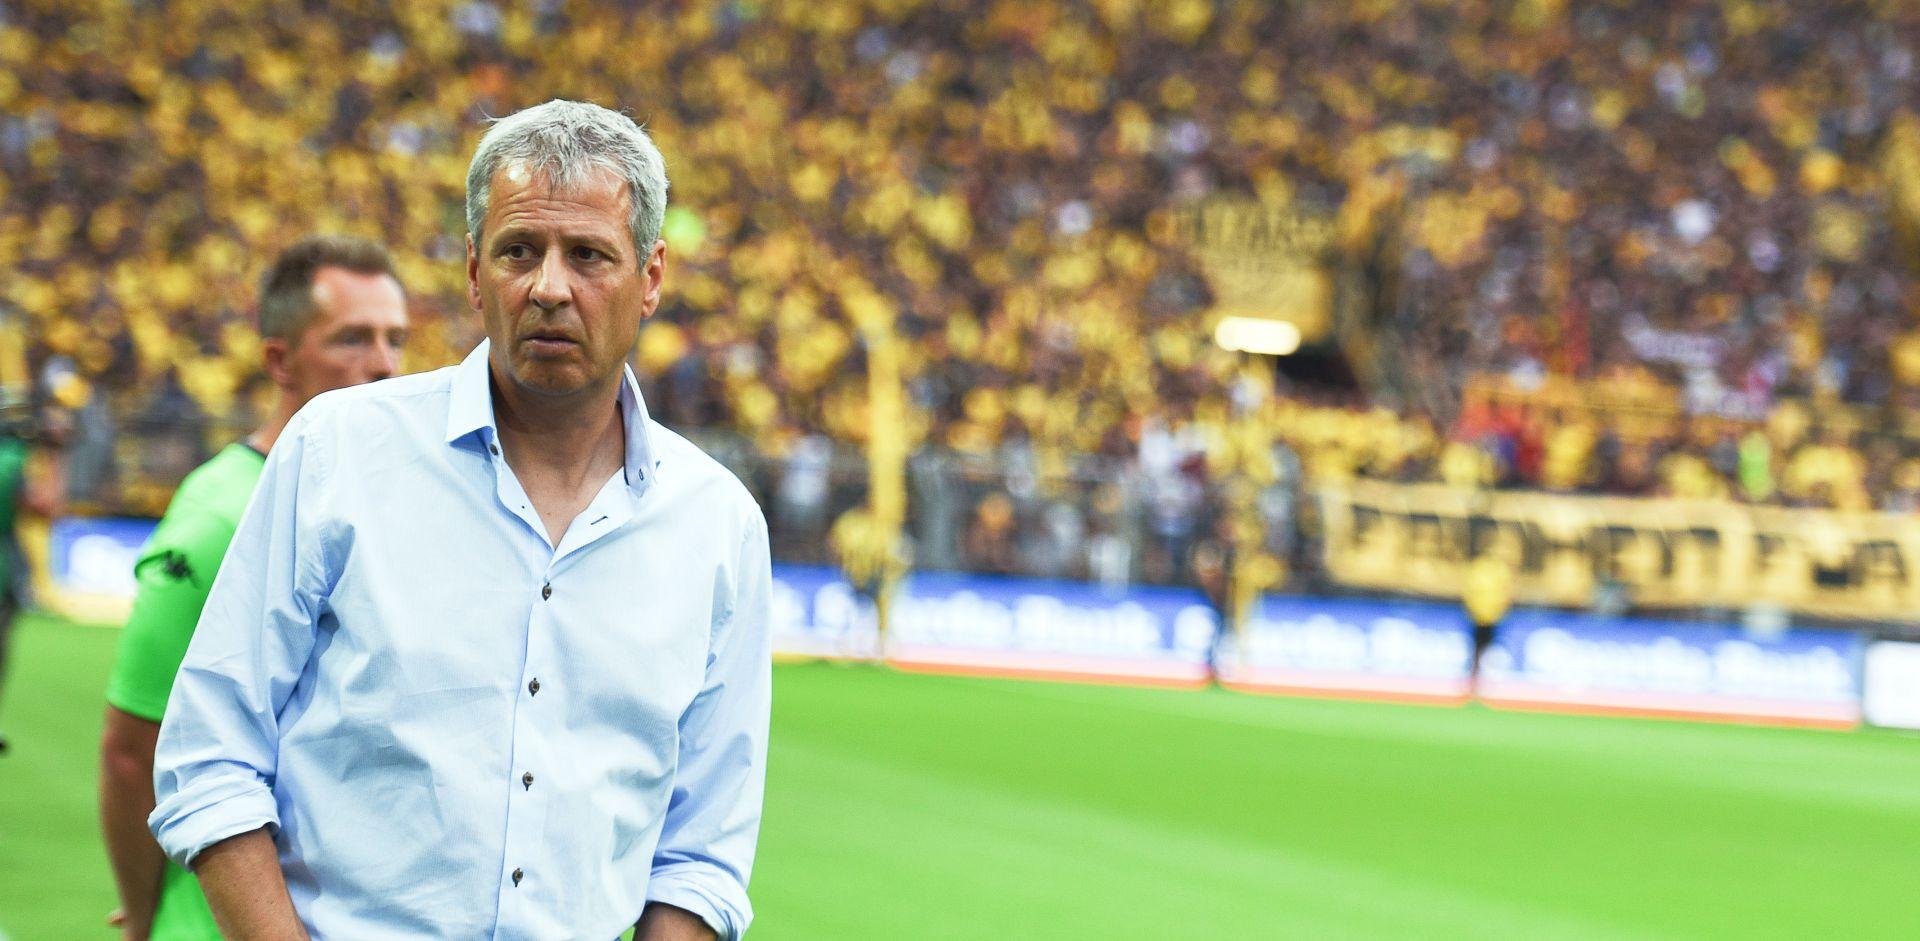 Švicarac Favre novi trener Borussie Dortmund